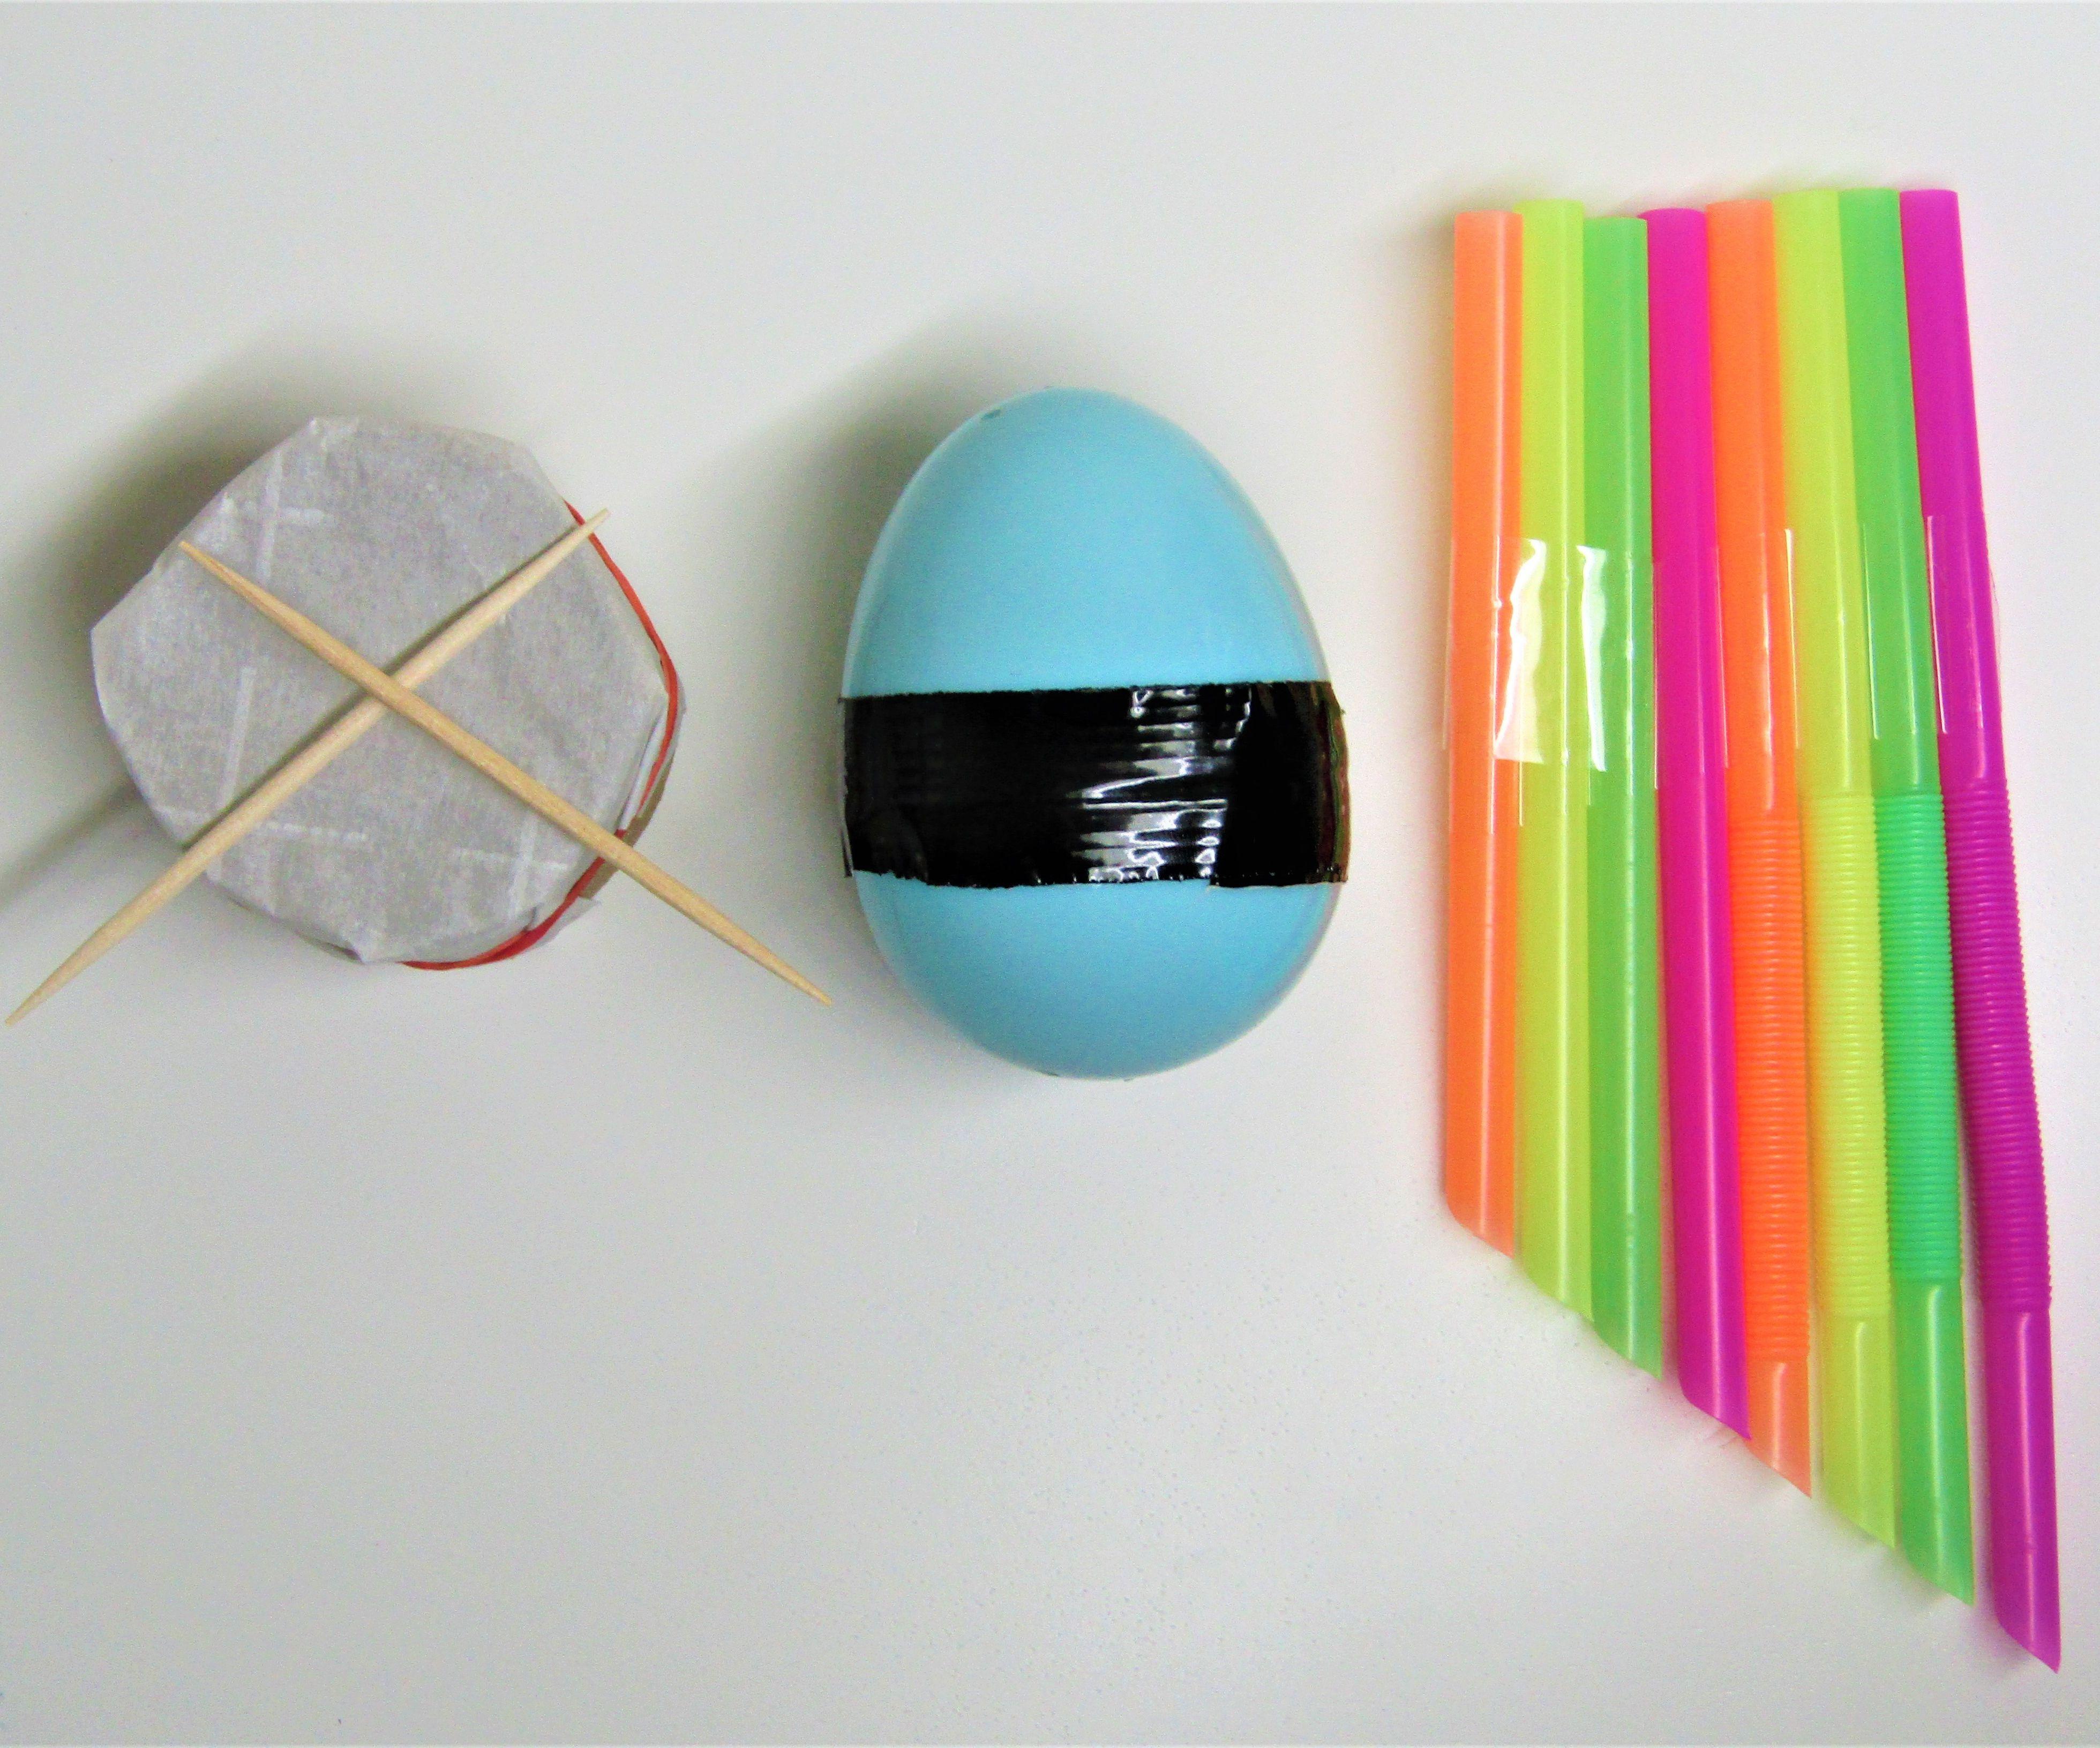 Pocket Sized Instruments